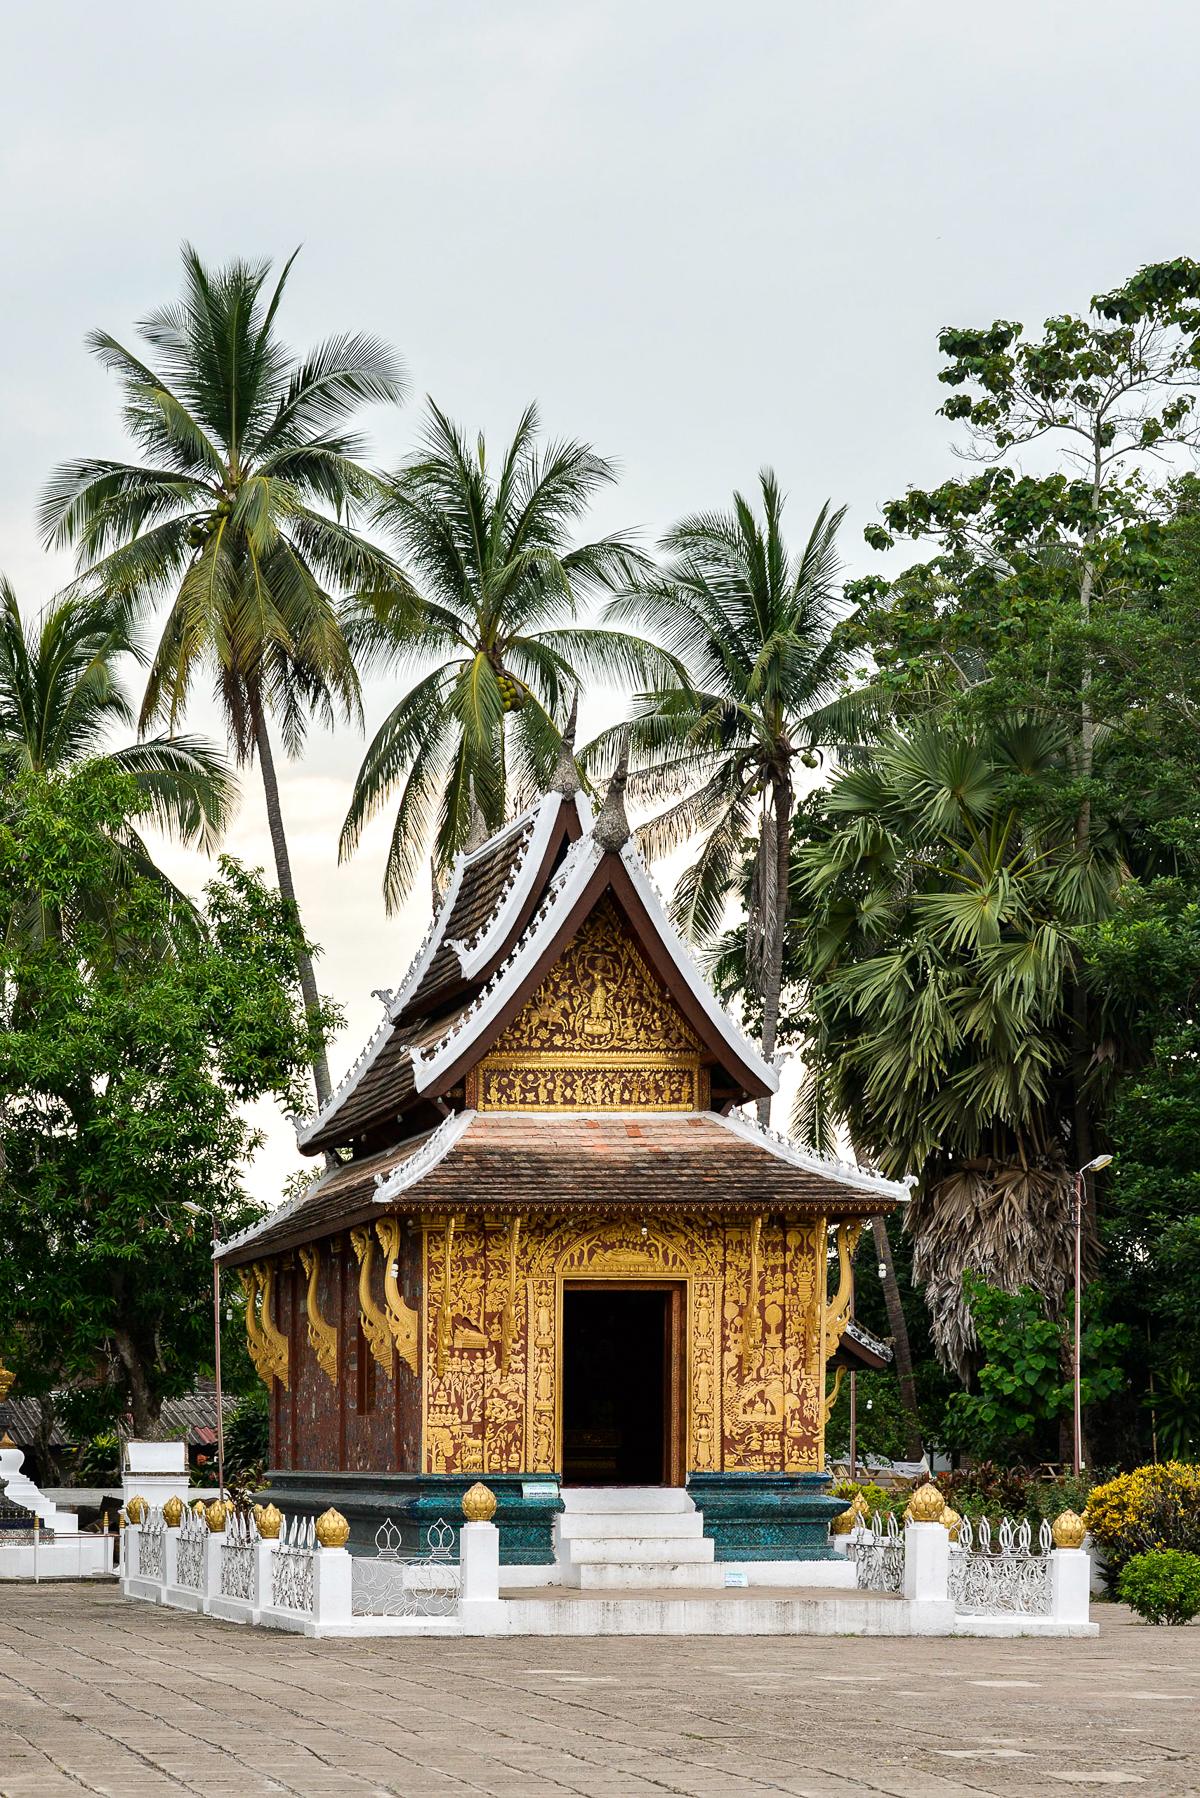 Stacie Flinner 3 Nagas Complete Guide to Luang Prabang-93.jpg